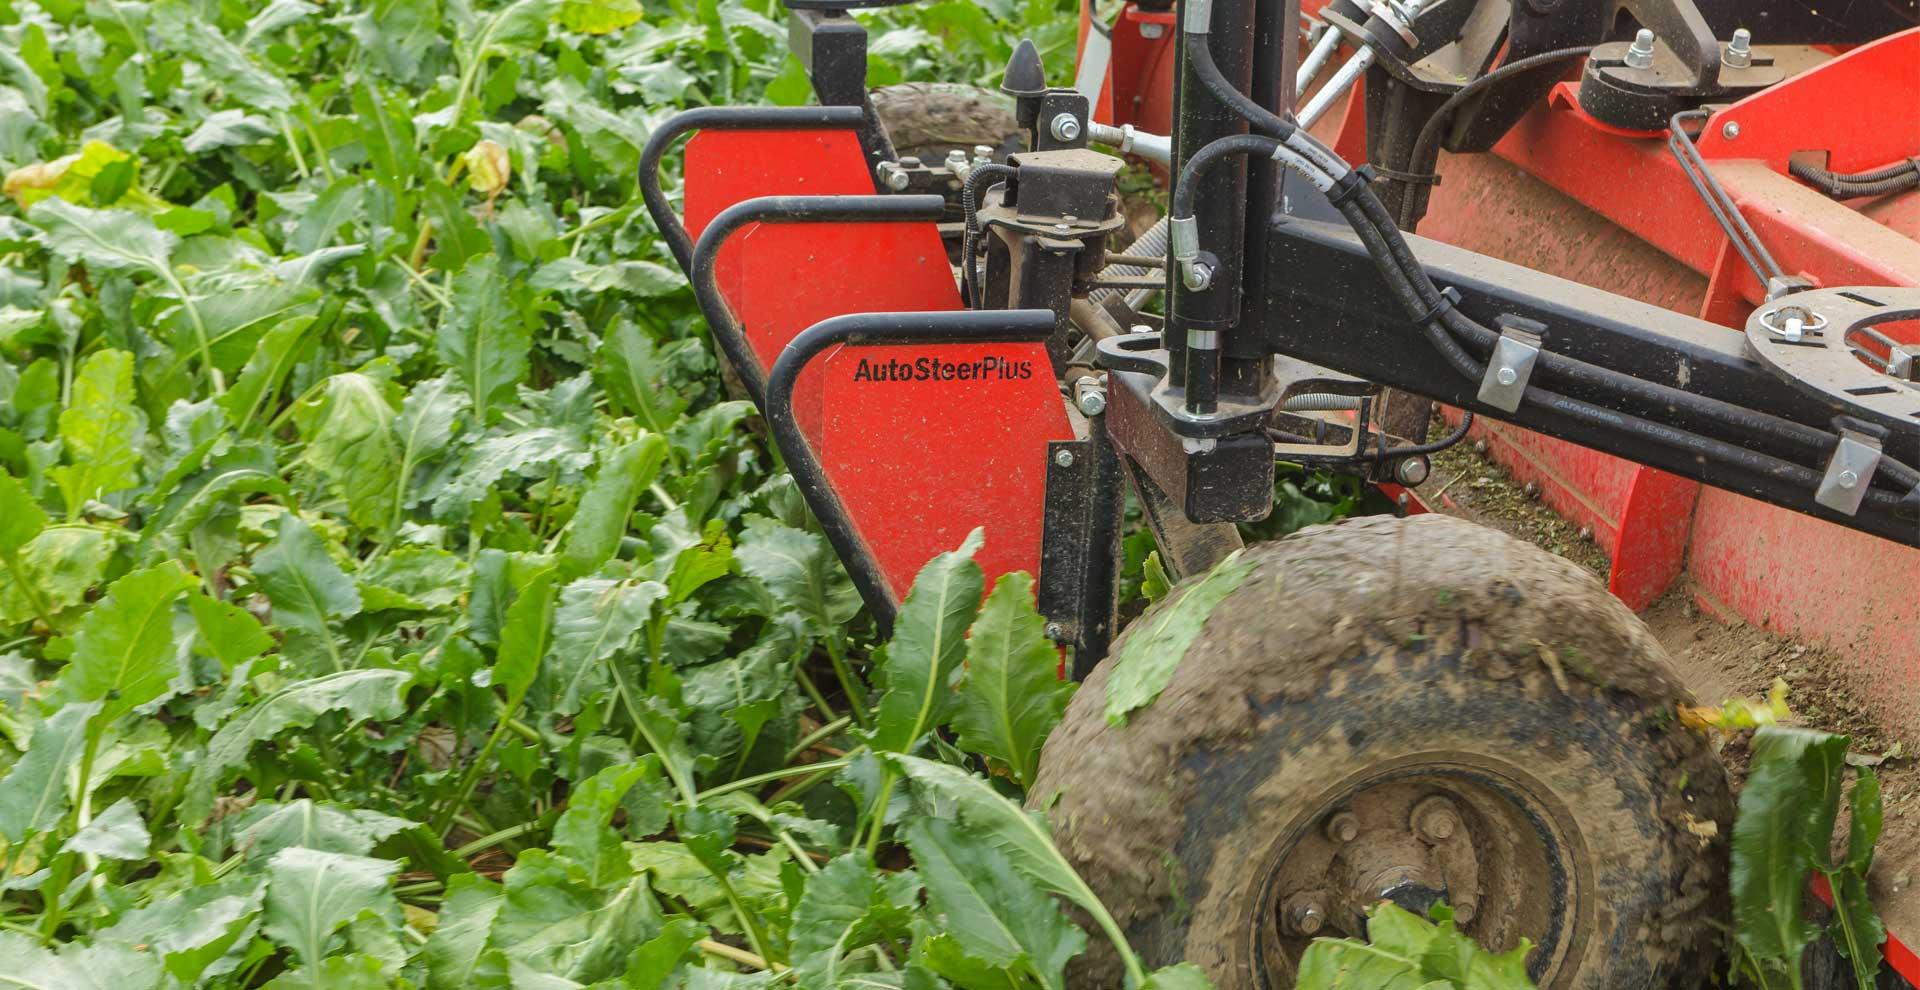 Agrifac AutoSteerPlus